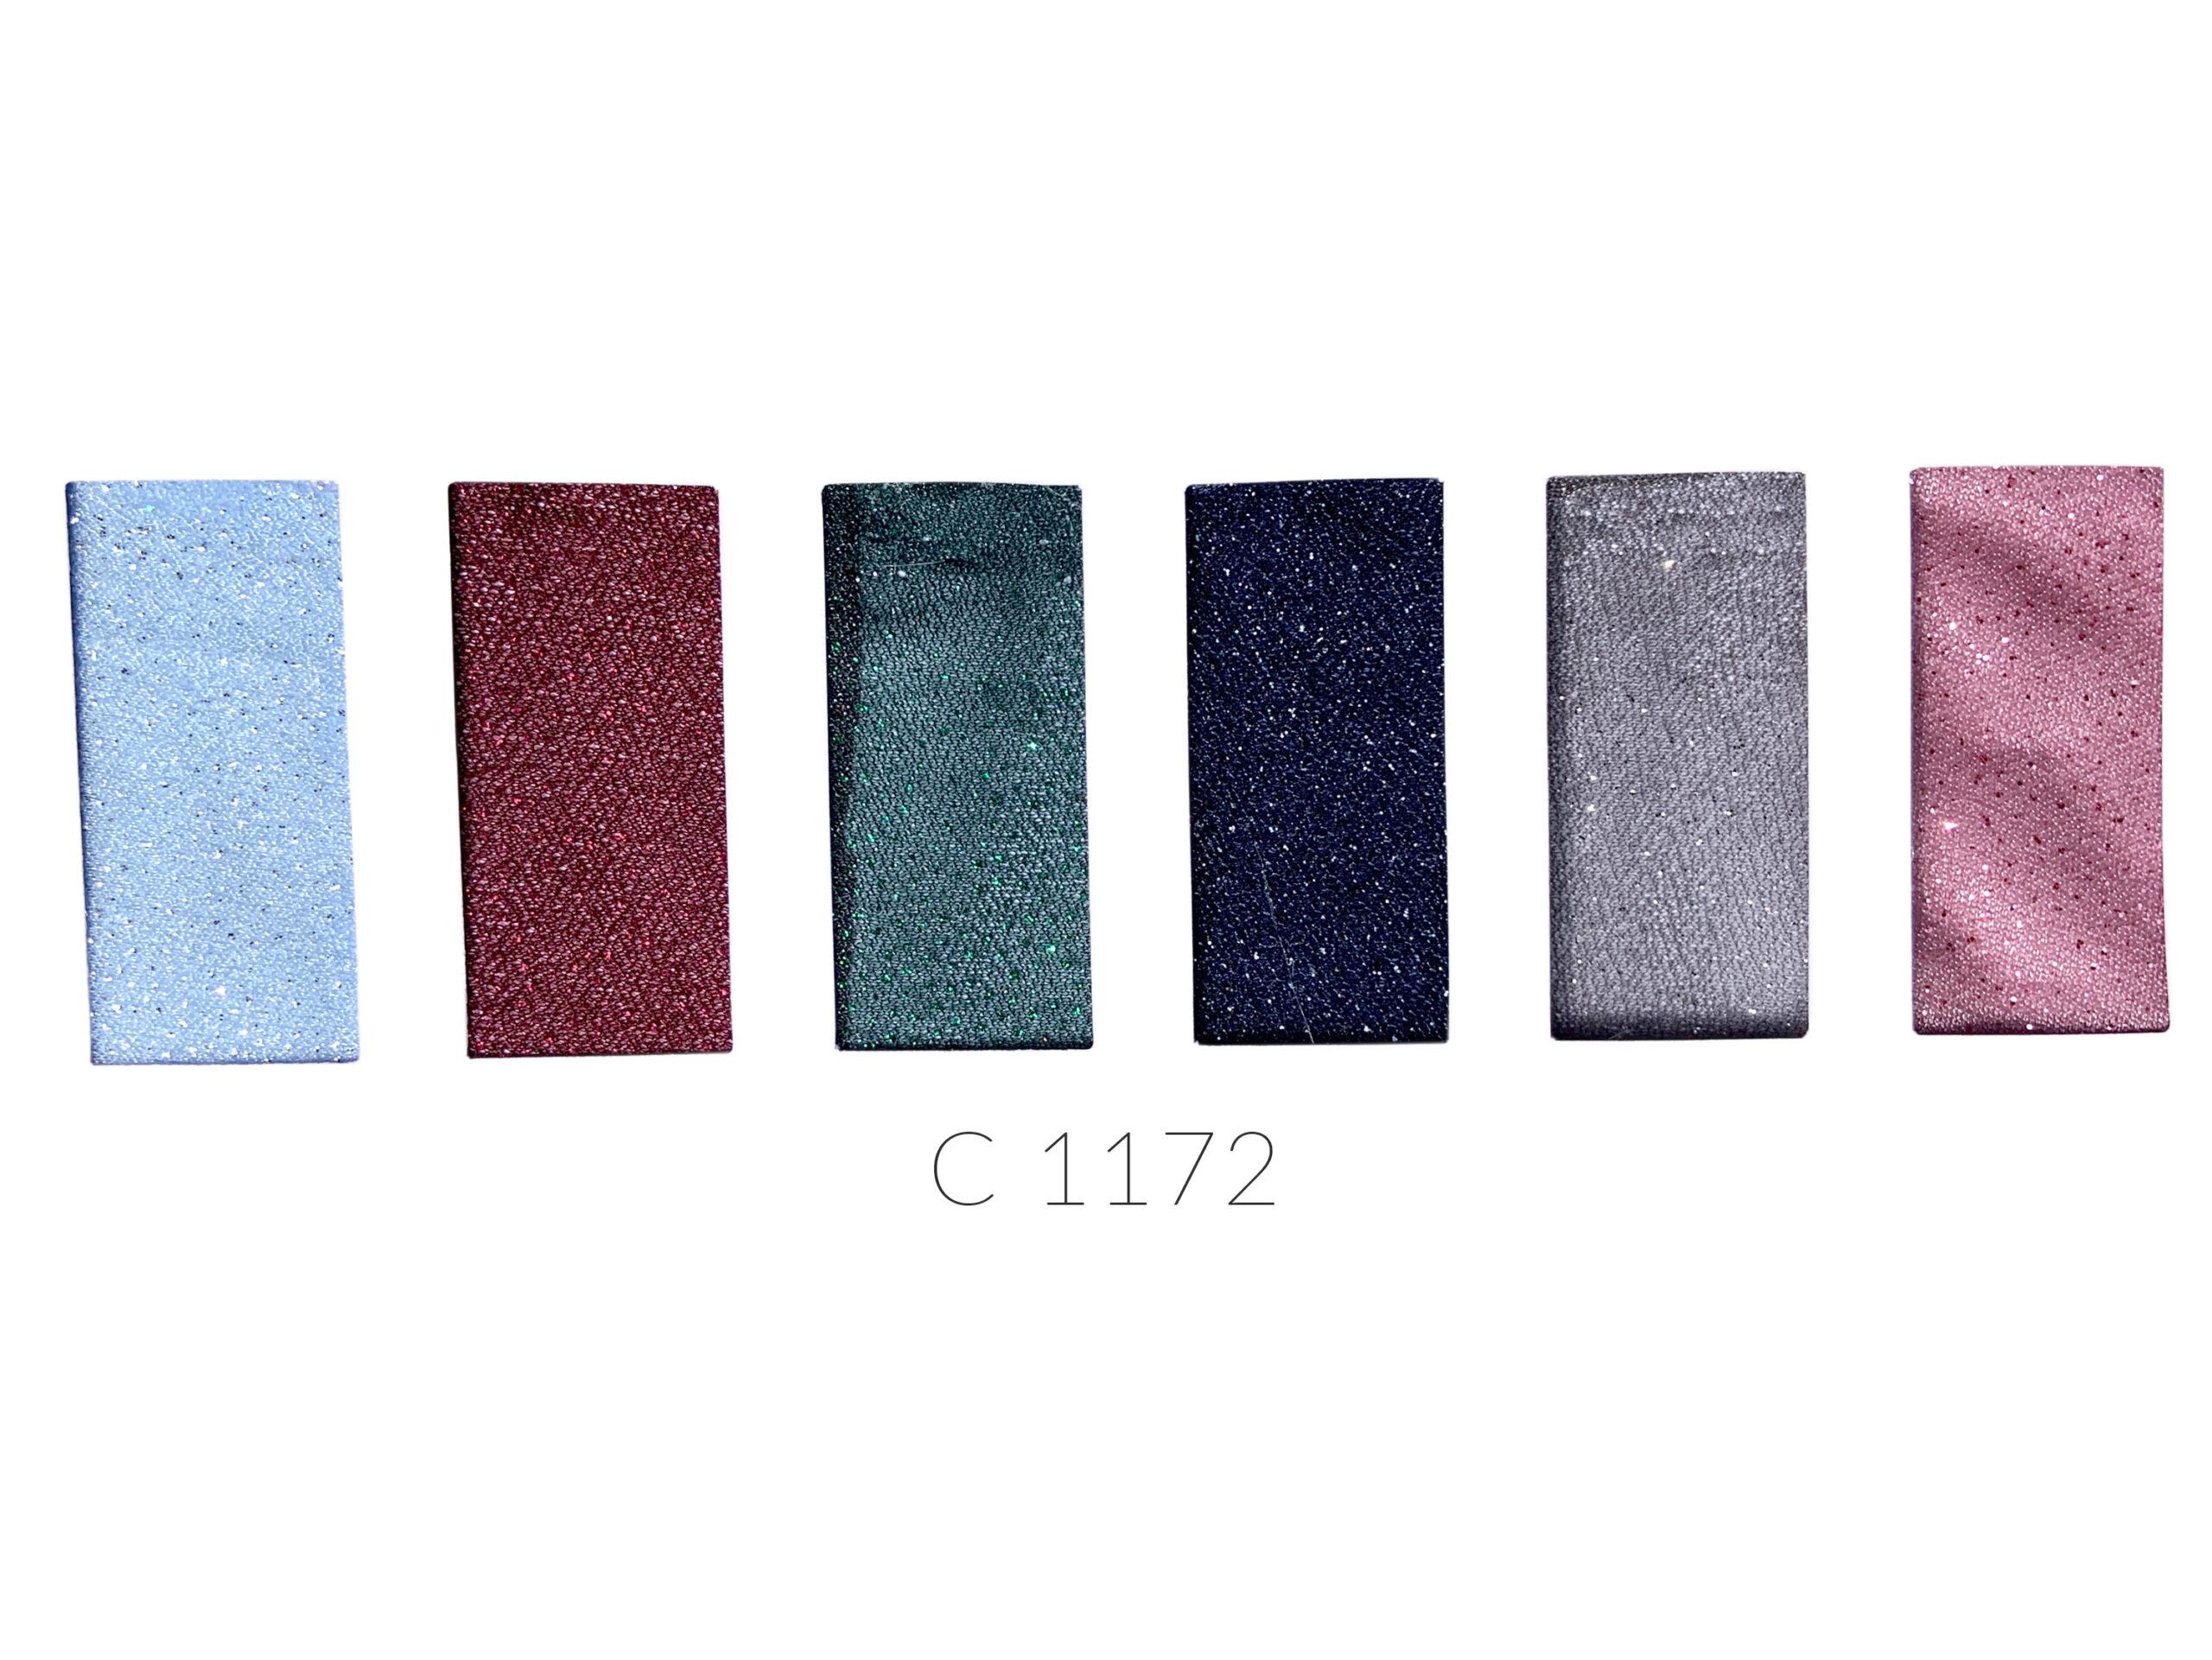 C1172